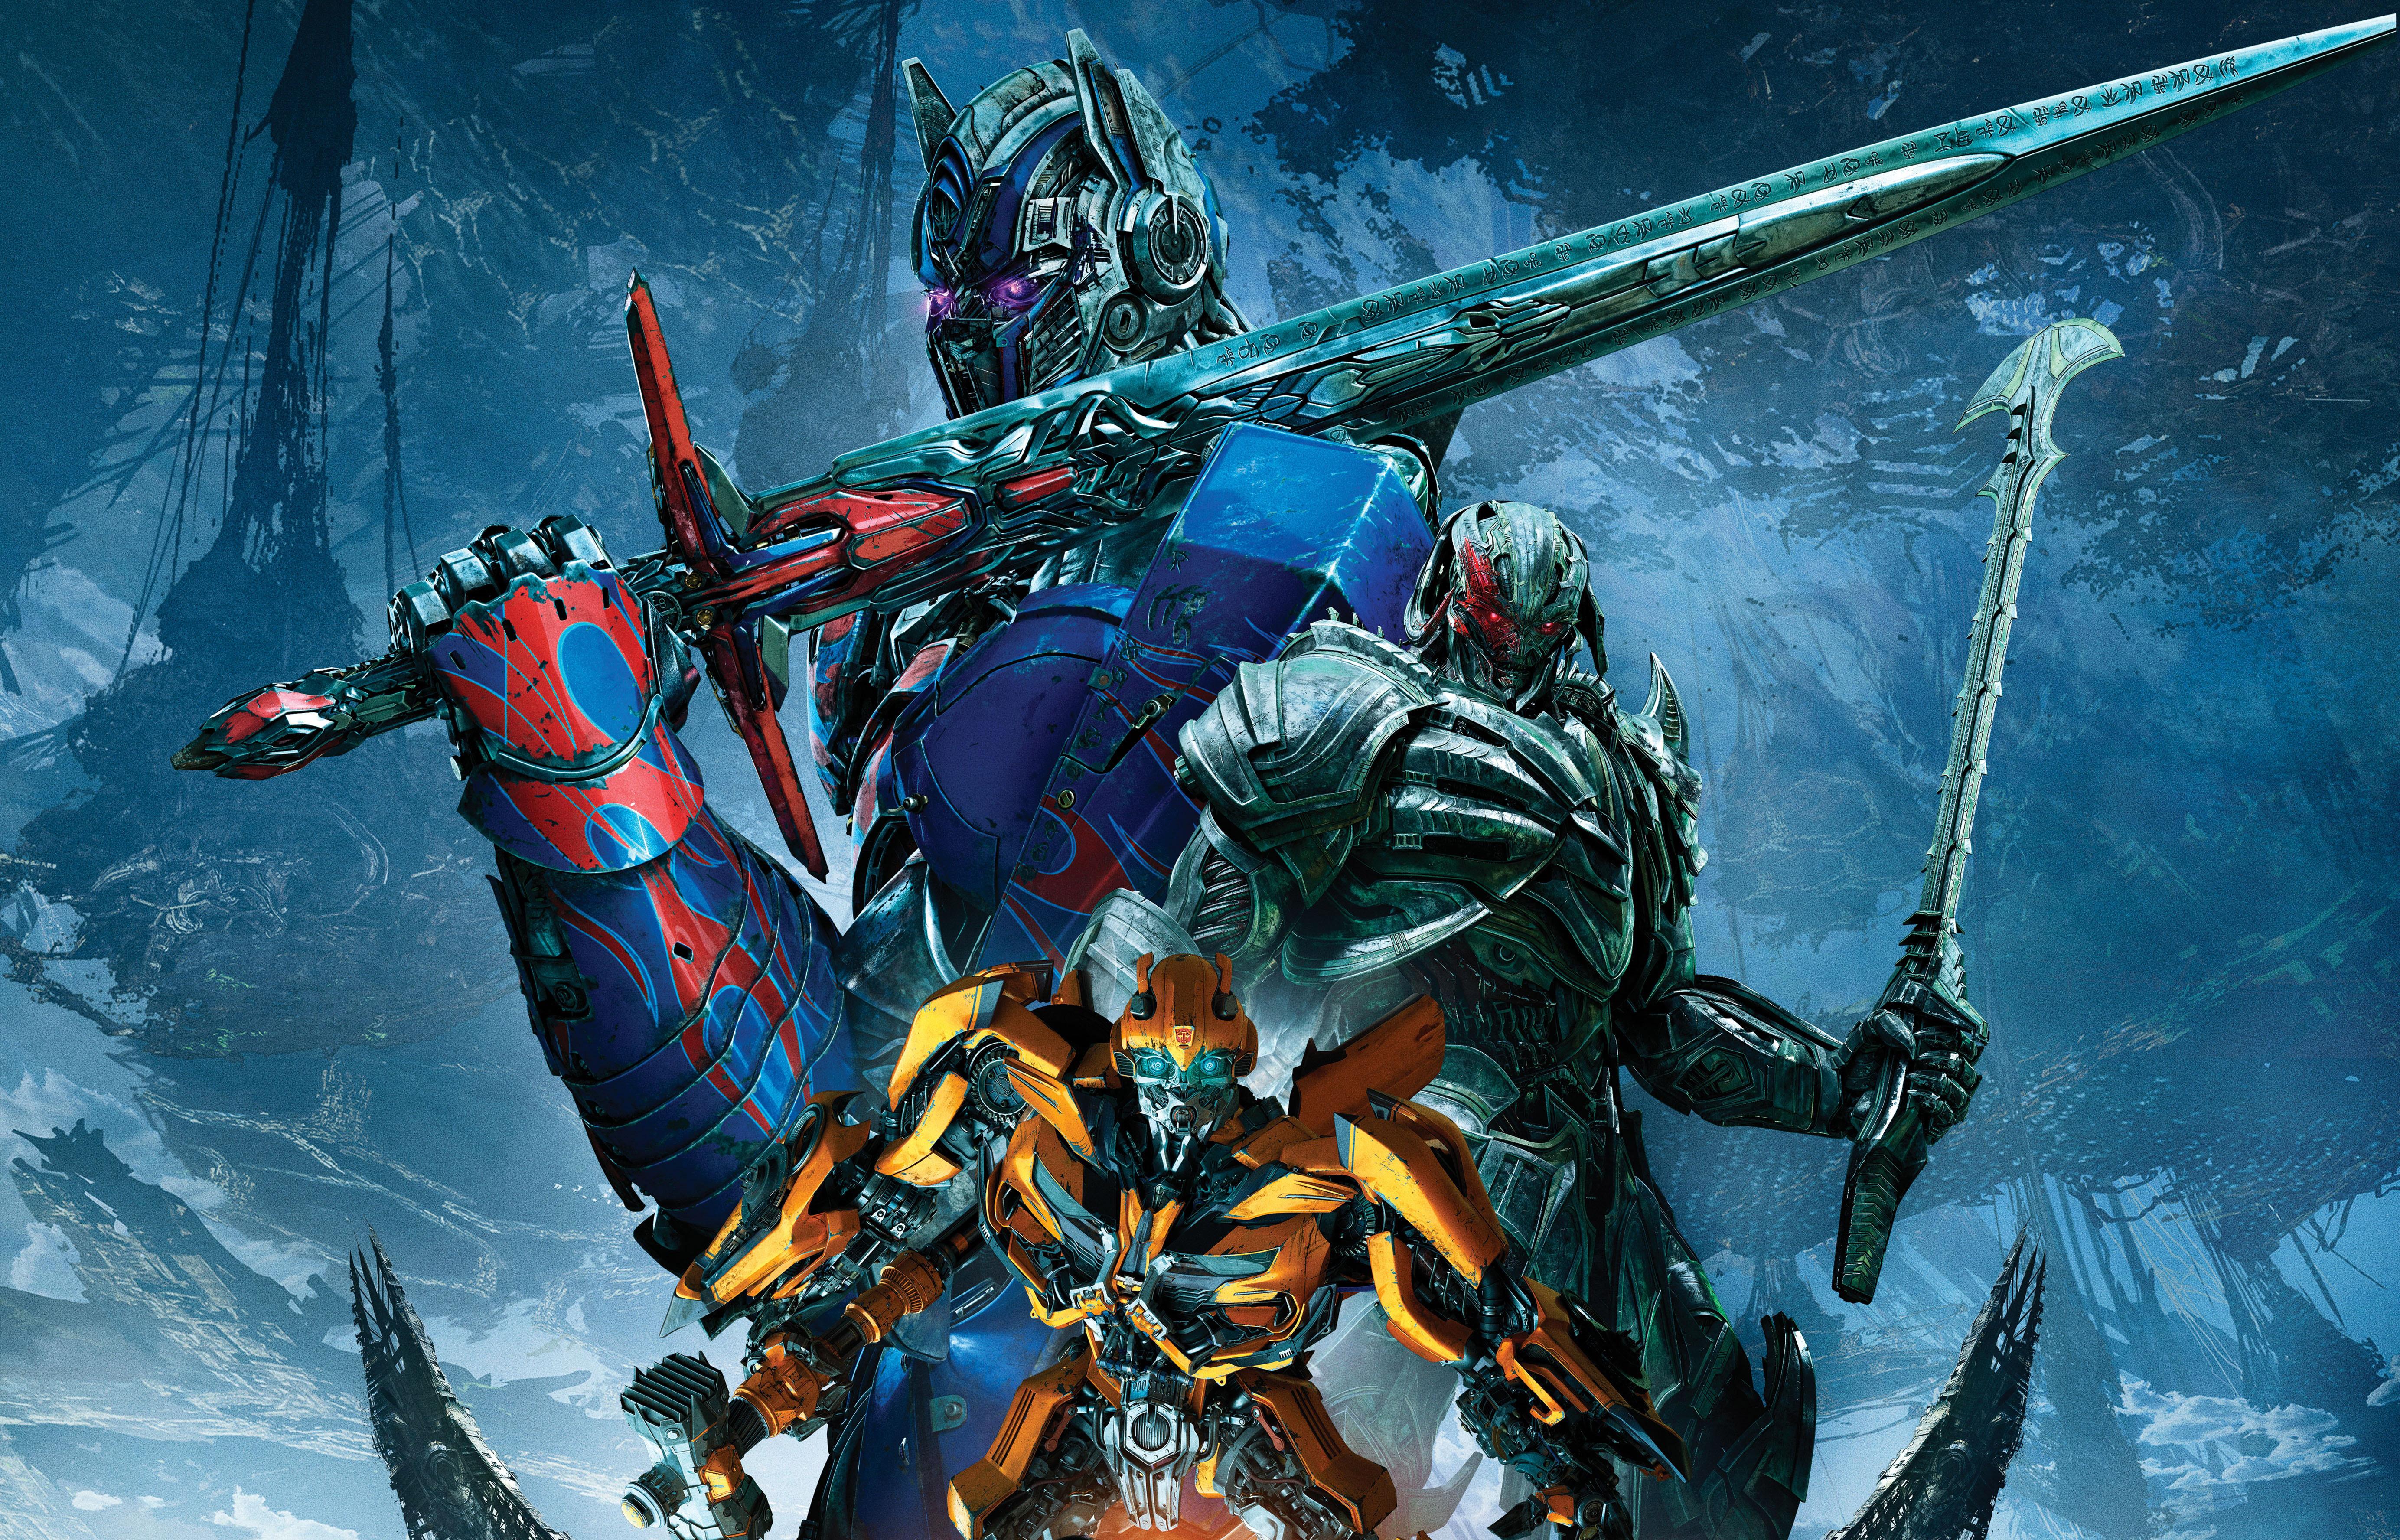 4096x3072 Transformers The Last Knight Bumblebee Megatron Optimus